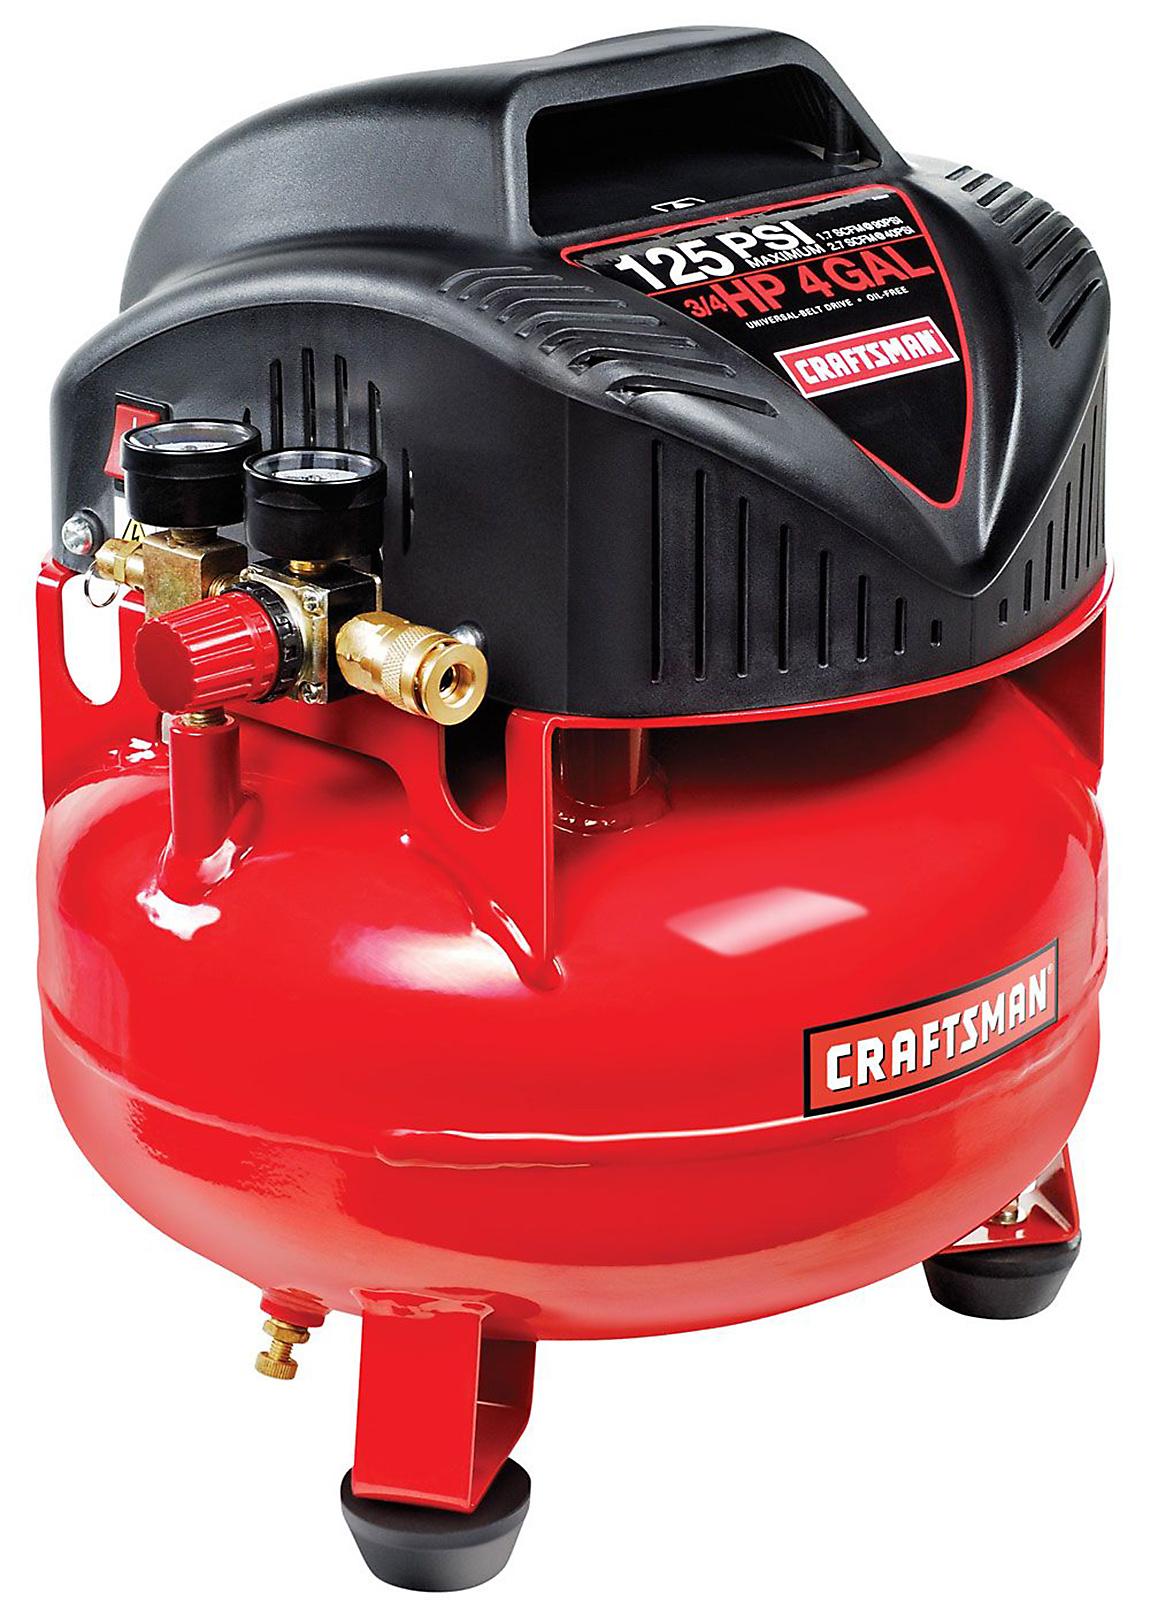 sears air compressor wiring diagram wiring diagrams simple craftsman 4 gallon 0 75 hp oil free [ 1150 x 1600 Pixel ]